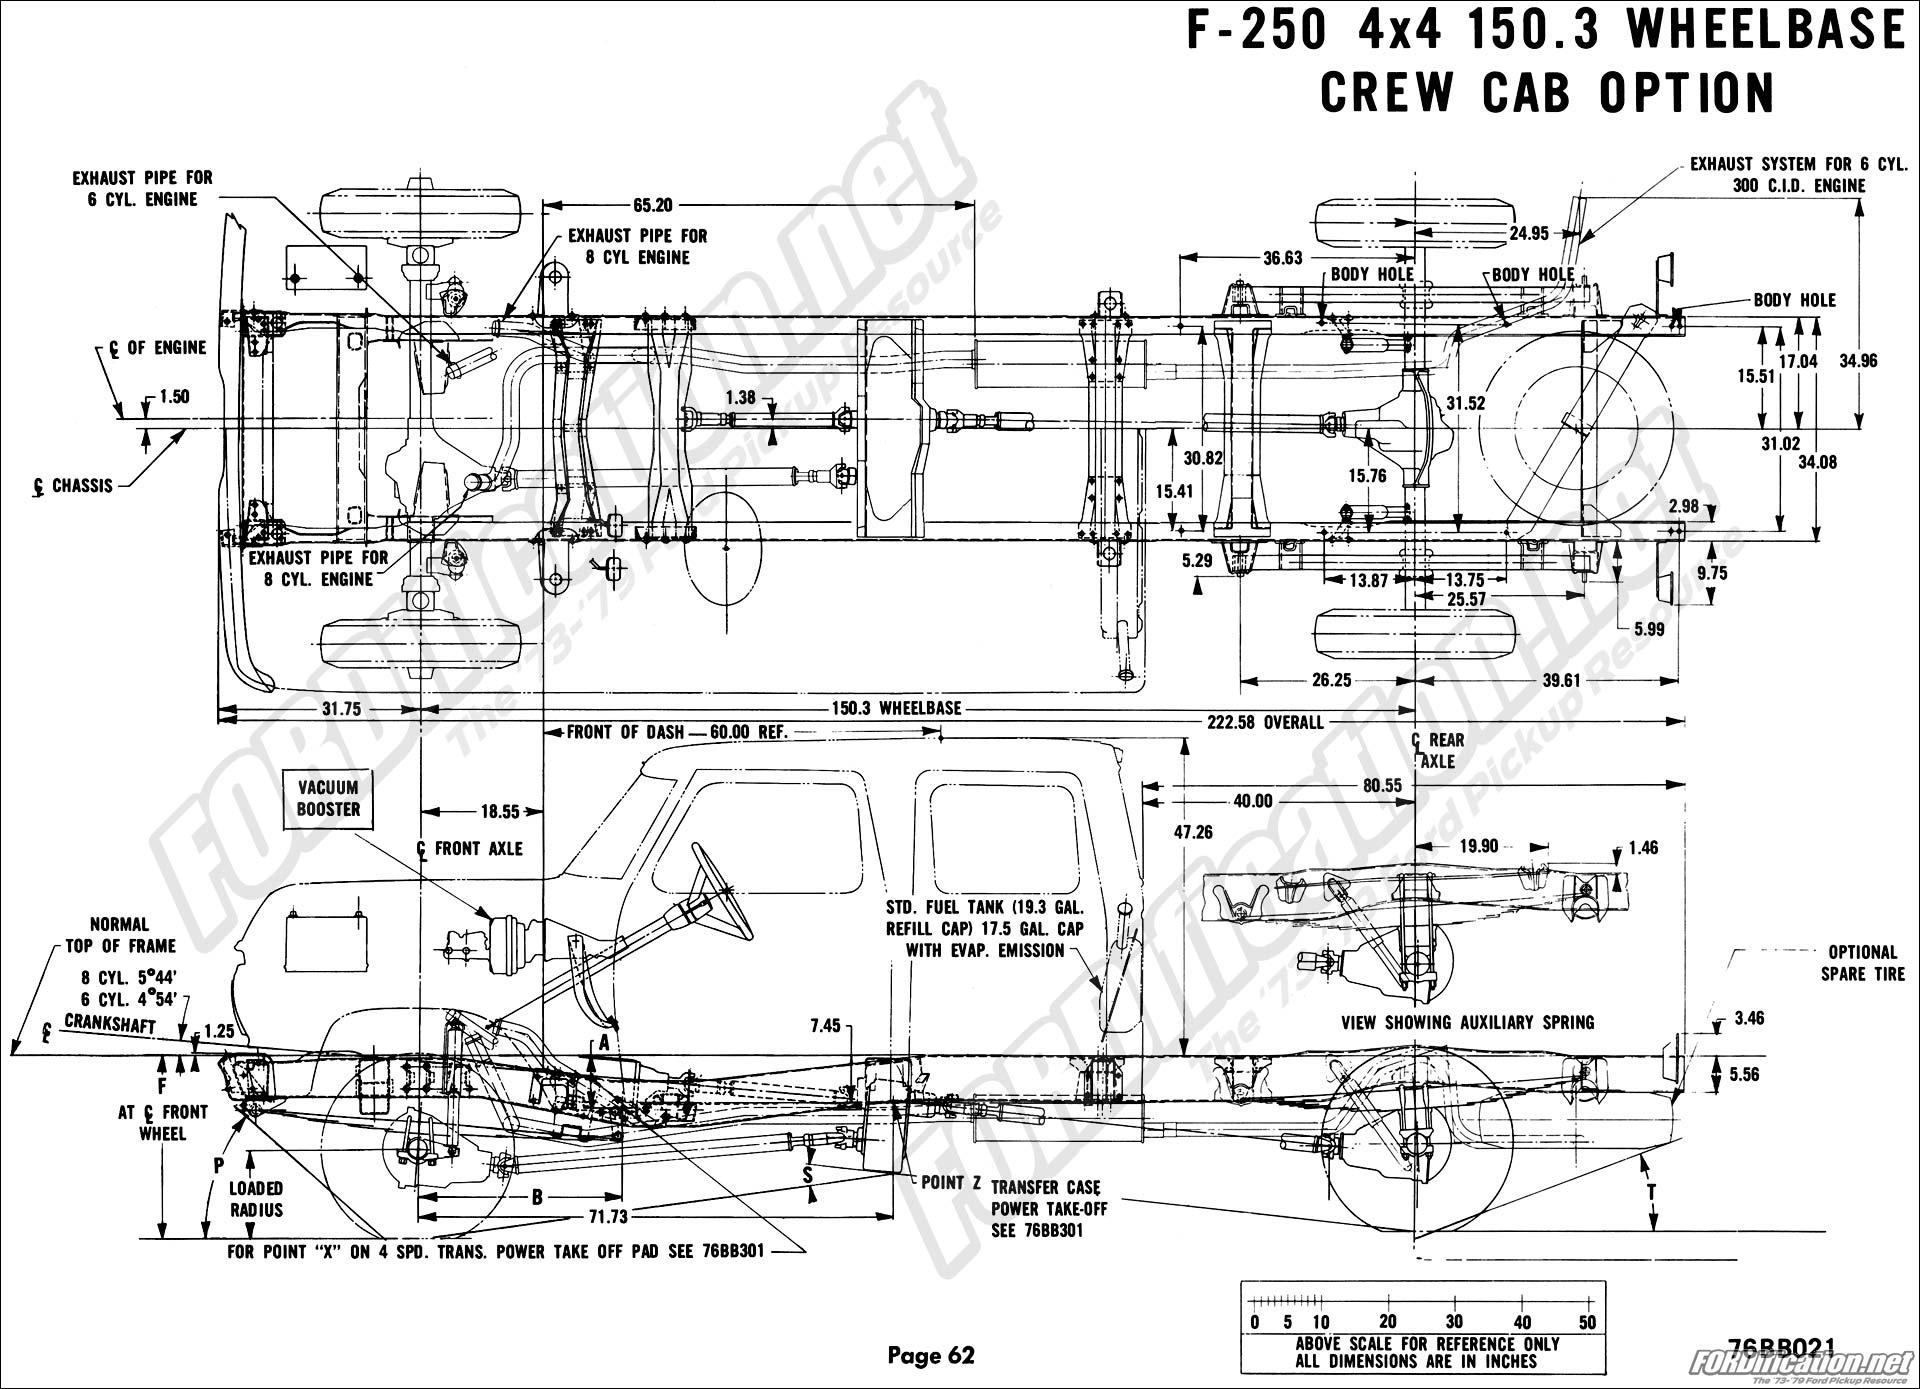 vy_9530] likewise ford ranger frame diagram on ford f150 frame ...  strai iosto licuk lukep unbe nedly phil trua inrebe abole ixtu ...